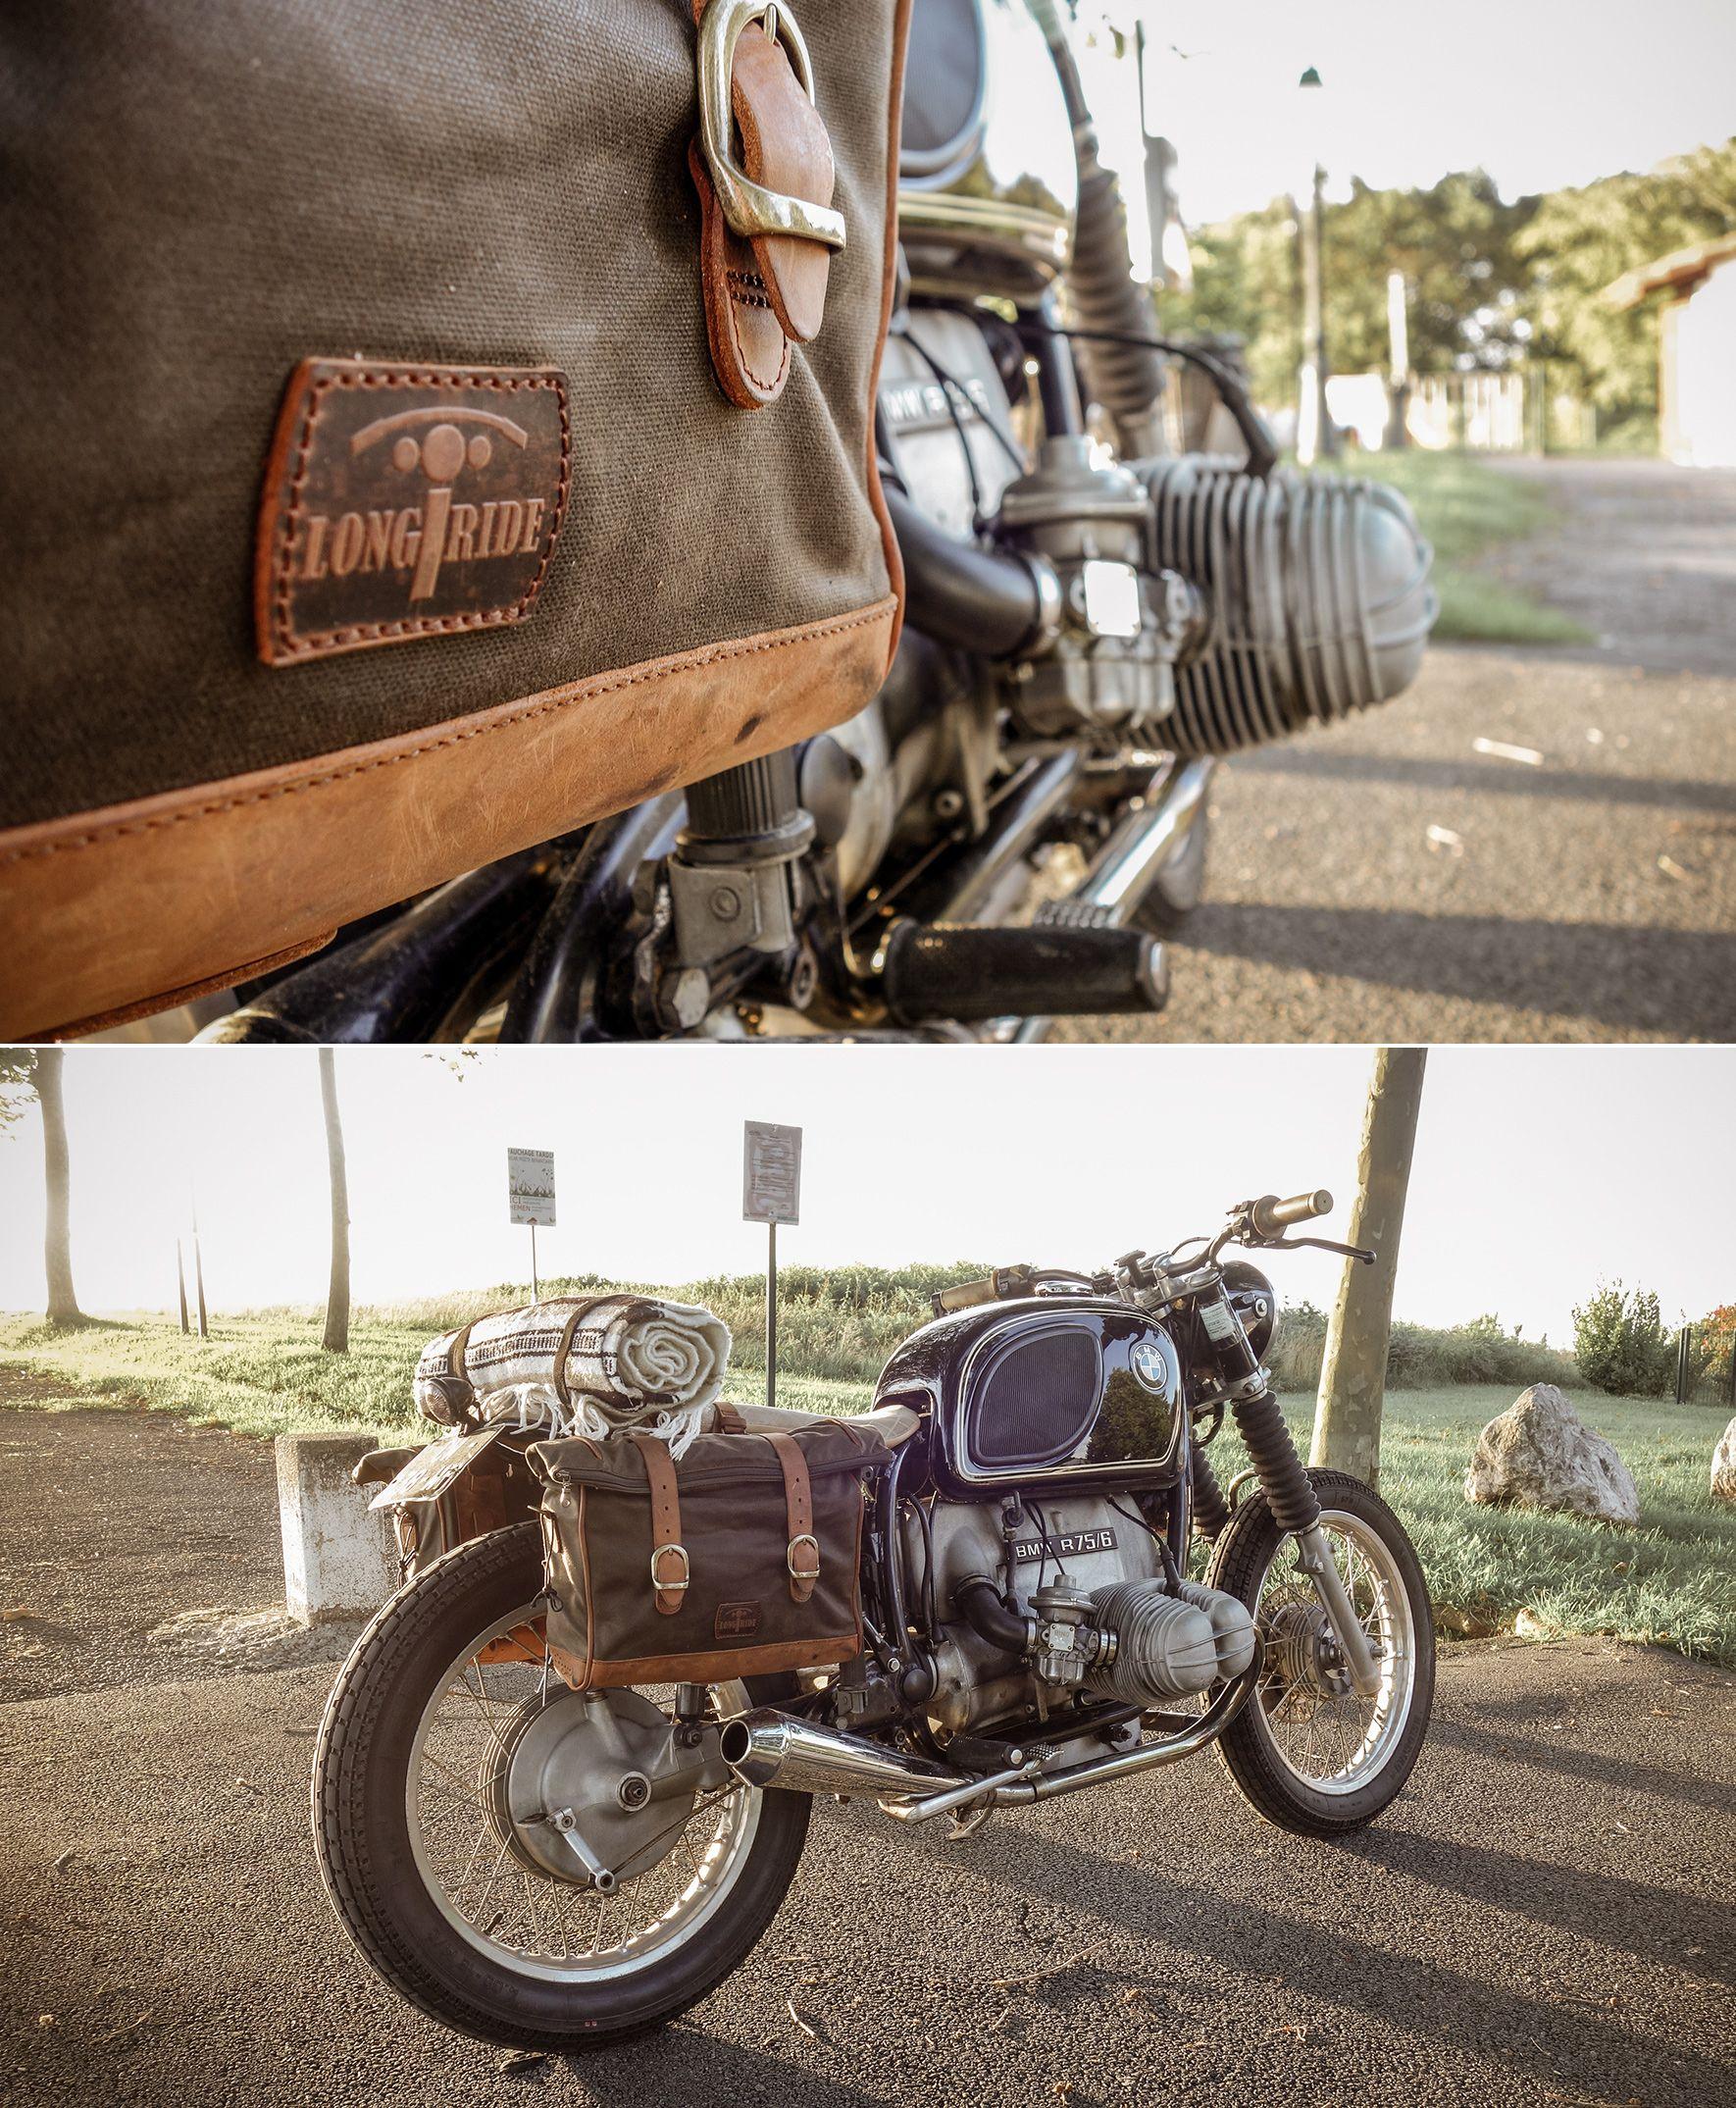 Khaki Patriot Saddlebag With Images Motorcycle Saddlebags